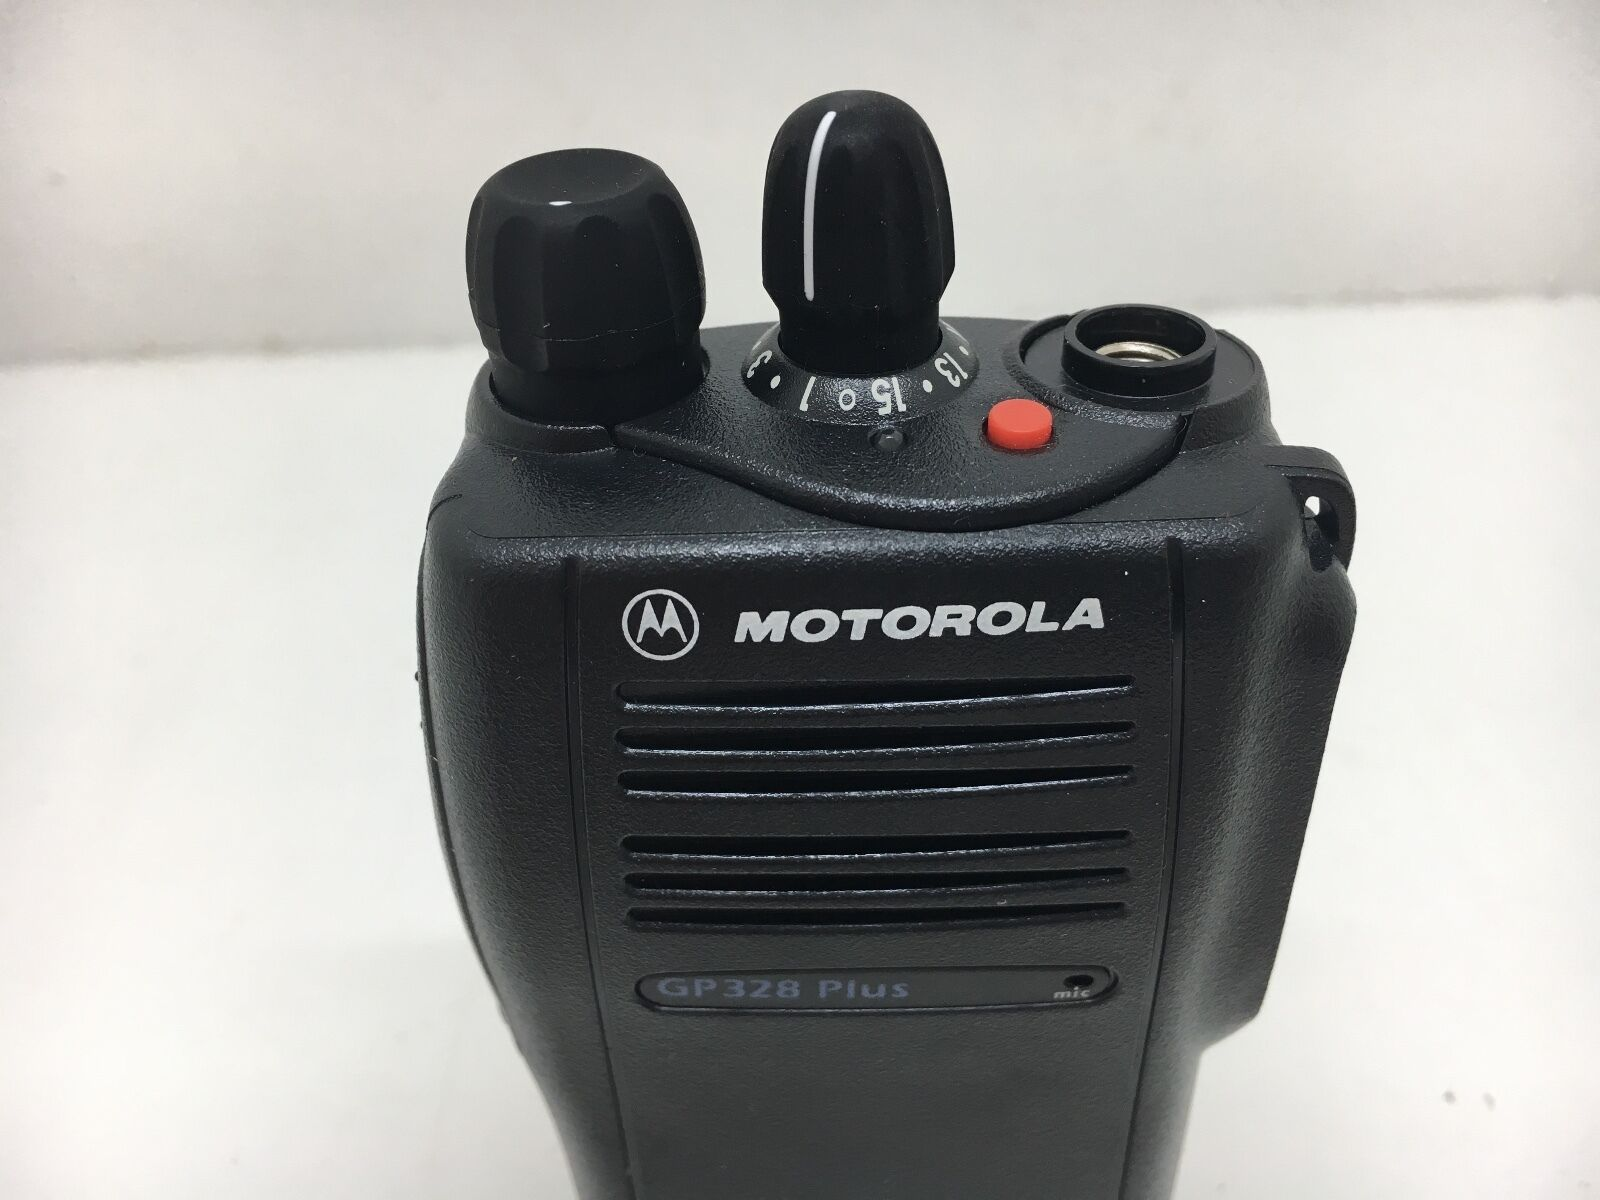 Globe Roamer Motorola AZH38SDC9AA3 GP328+ 16 Channel UHF Range 2 Portable  Radio | Shopping Bin - Search eBay faster